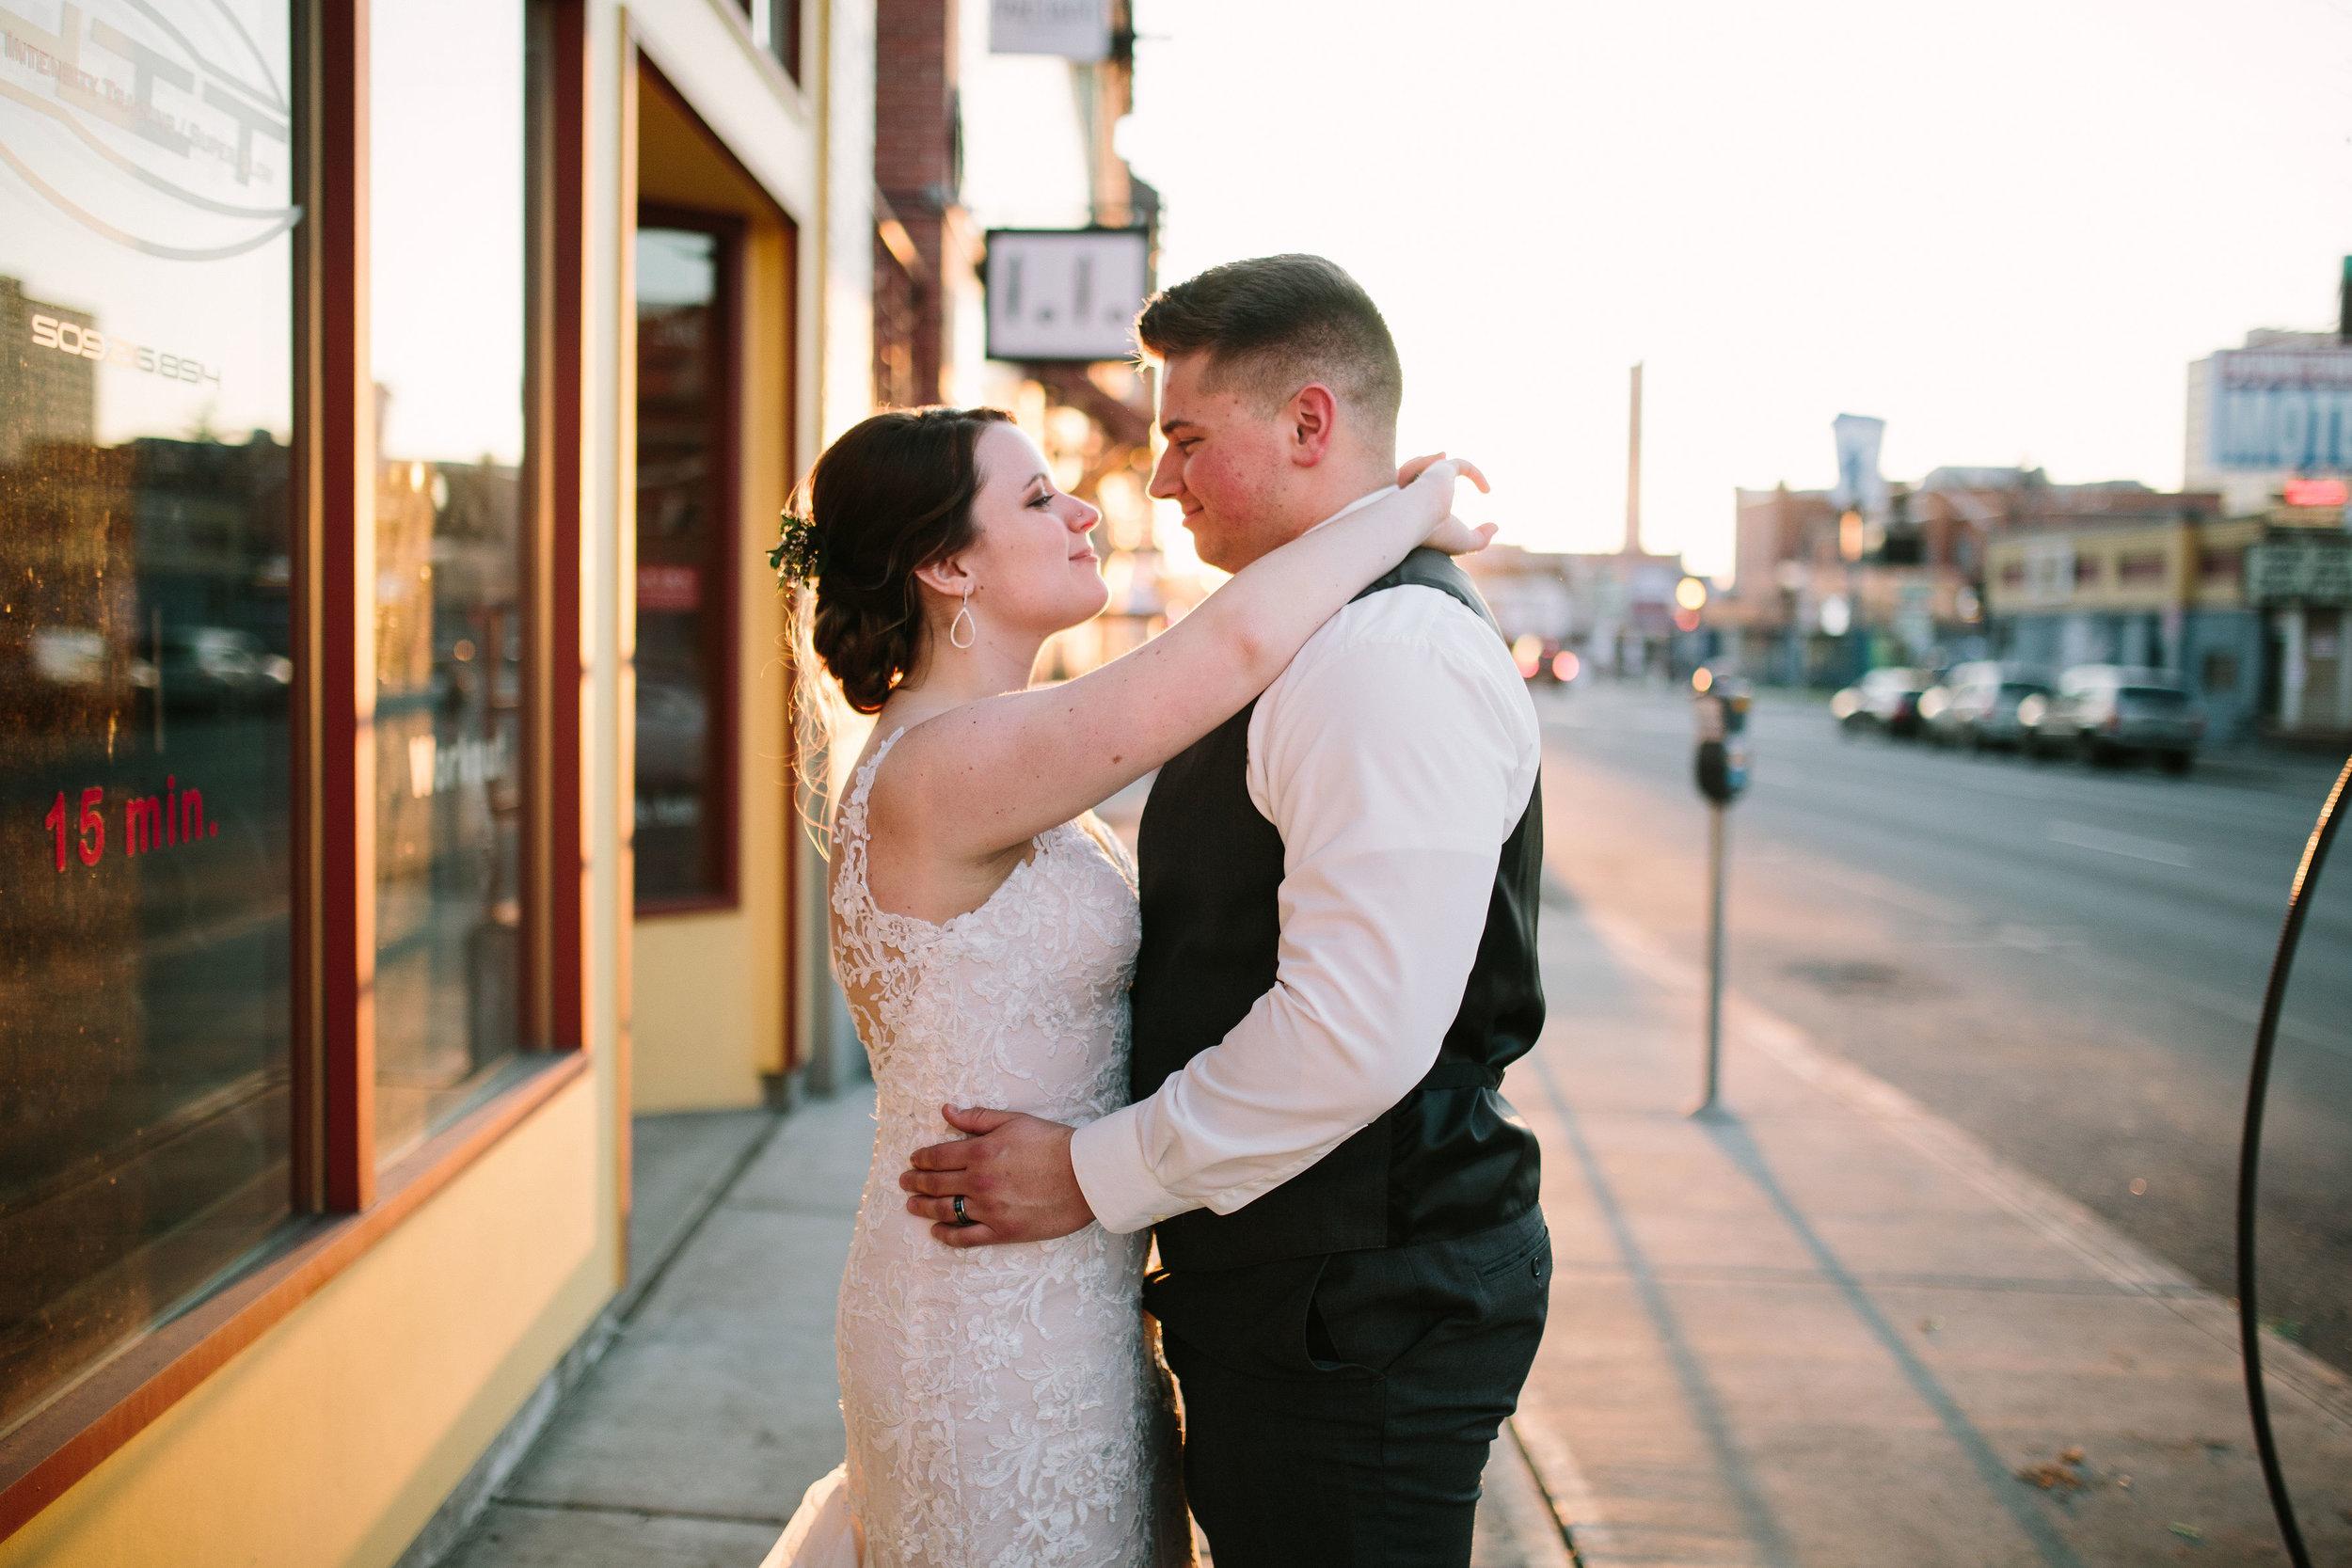 Fun Rustic spokane wedding street downtown starring eyes